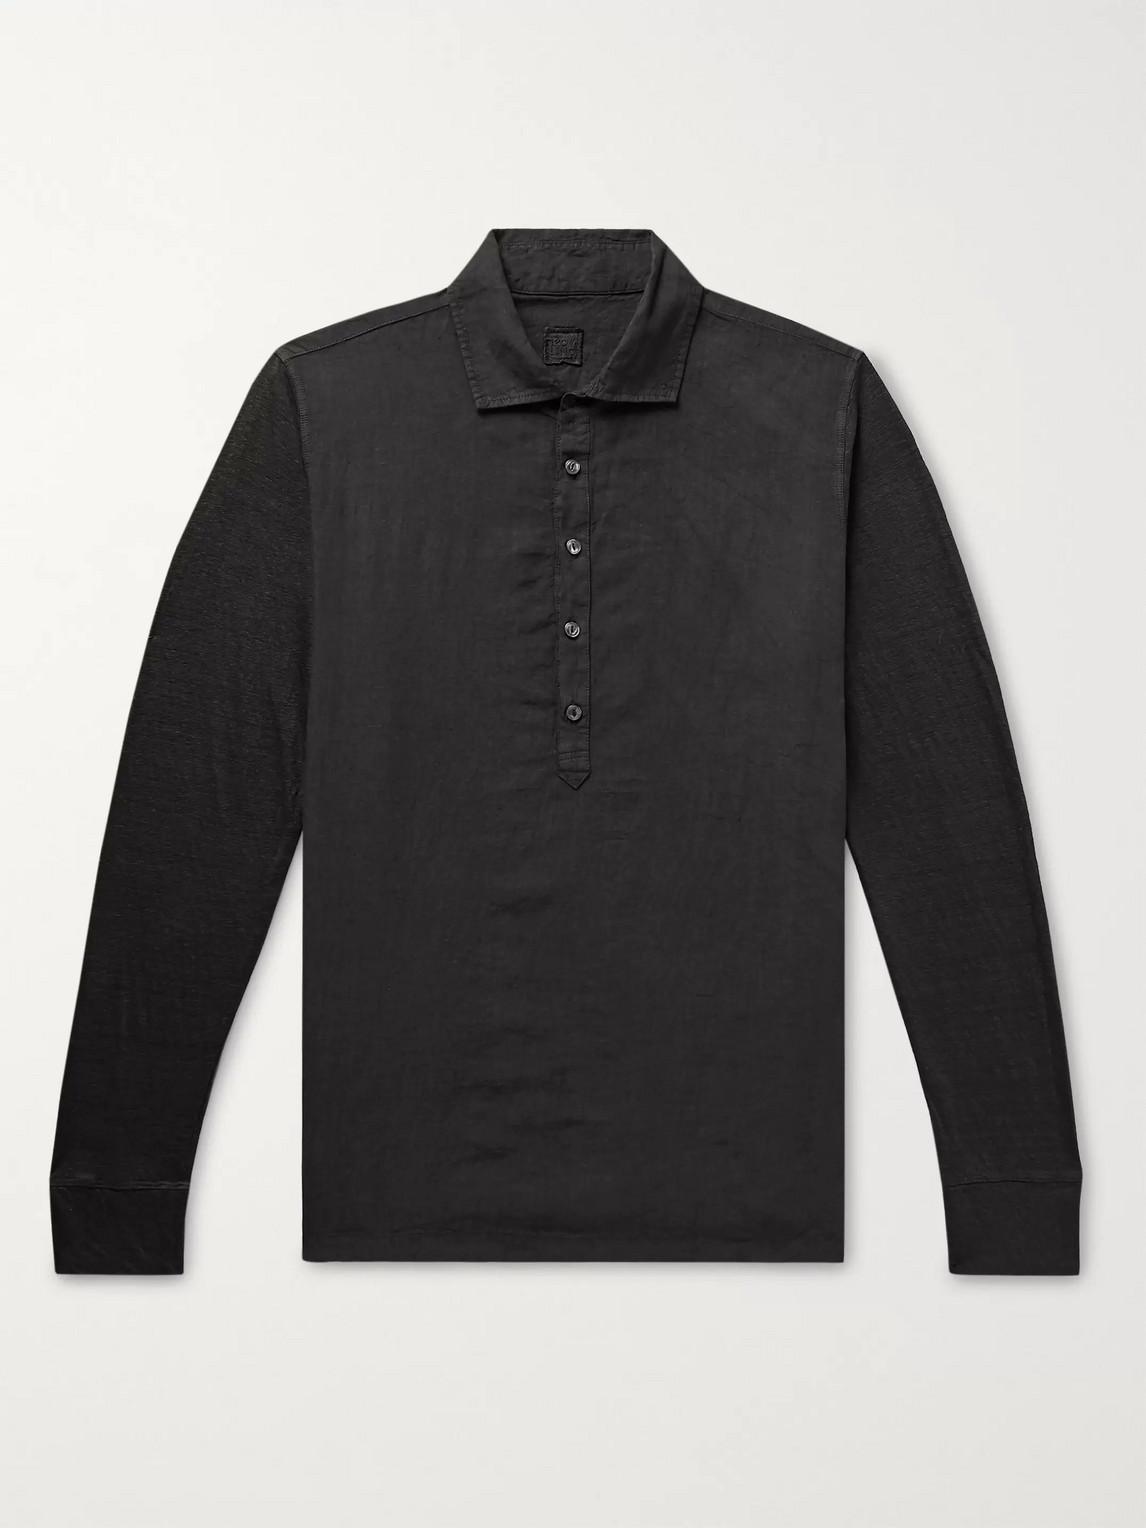 120% Garment-dyed Linen Polo Shirt In Black